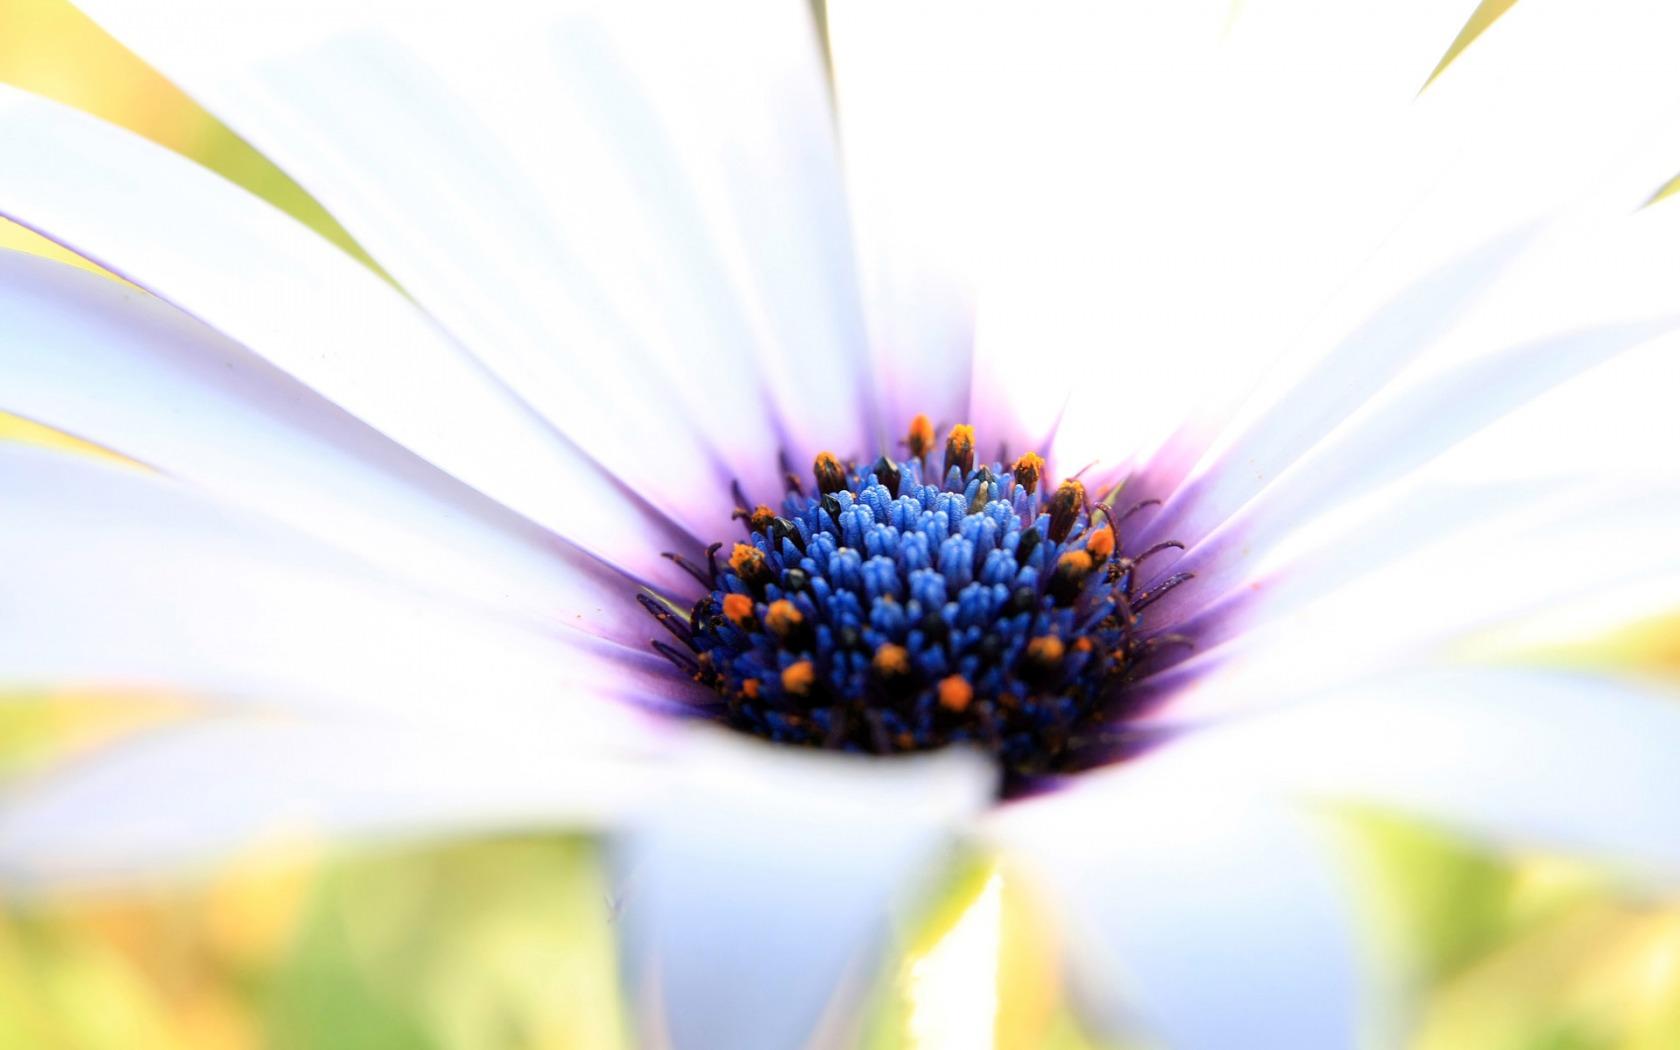 Amazing Wallpaper High Resolution Flower - white_flower_macro_wallpaper_flowers_nature_1307  Collection_429177.jpg